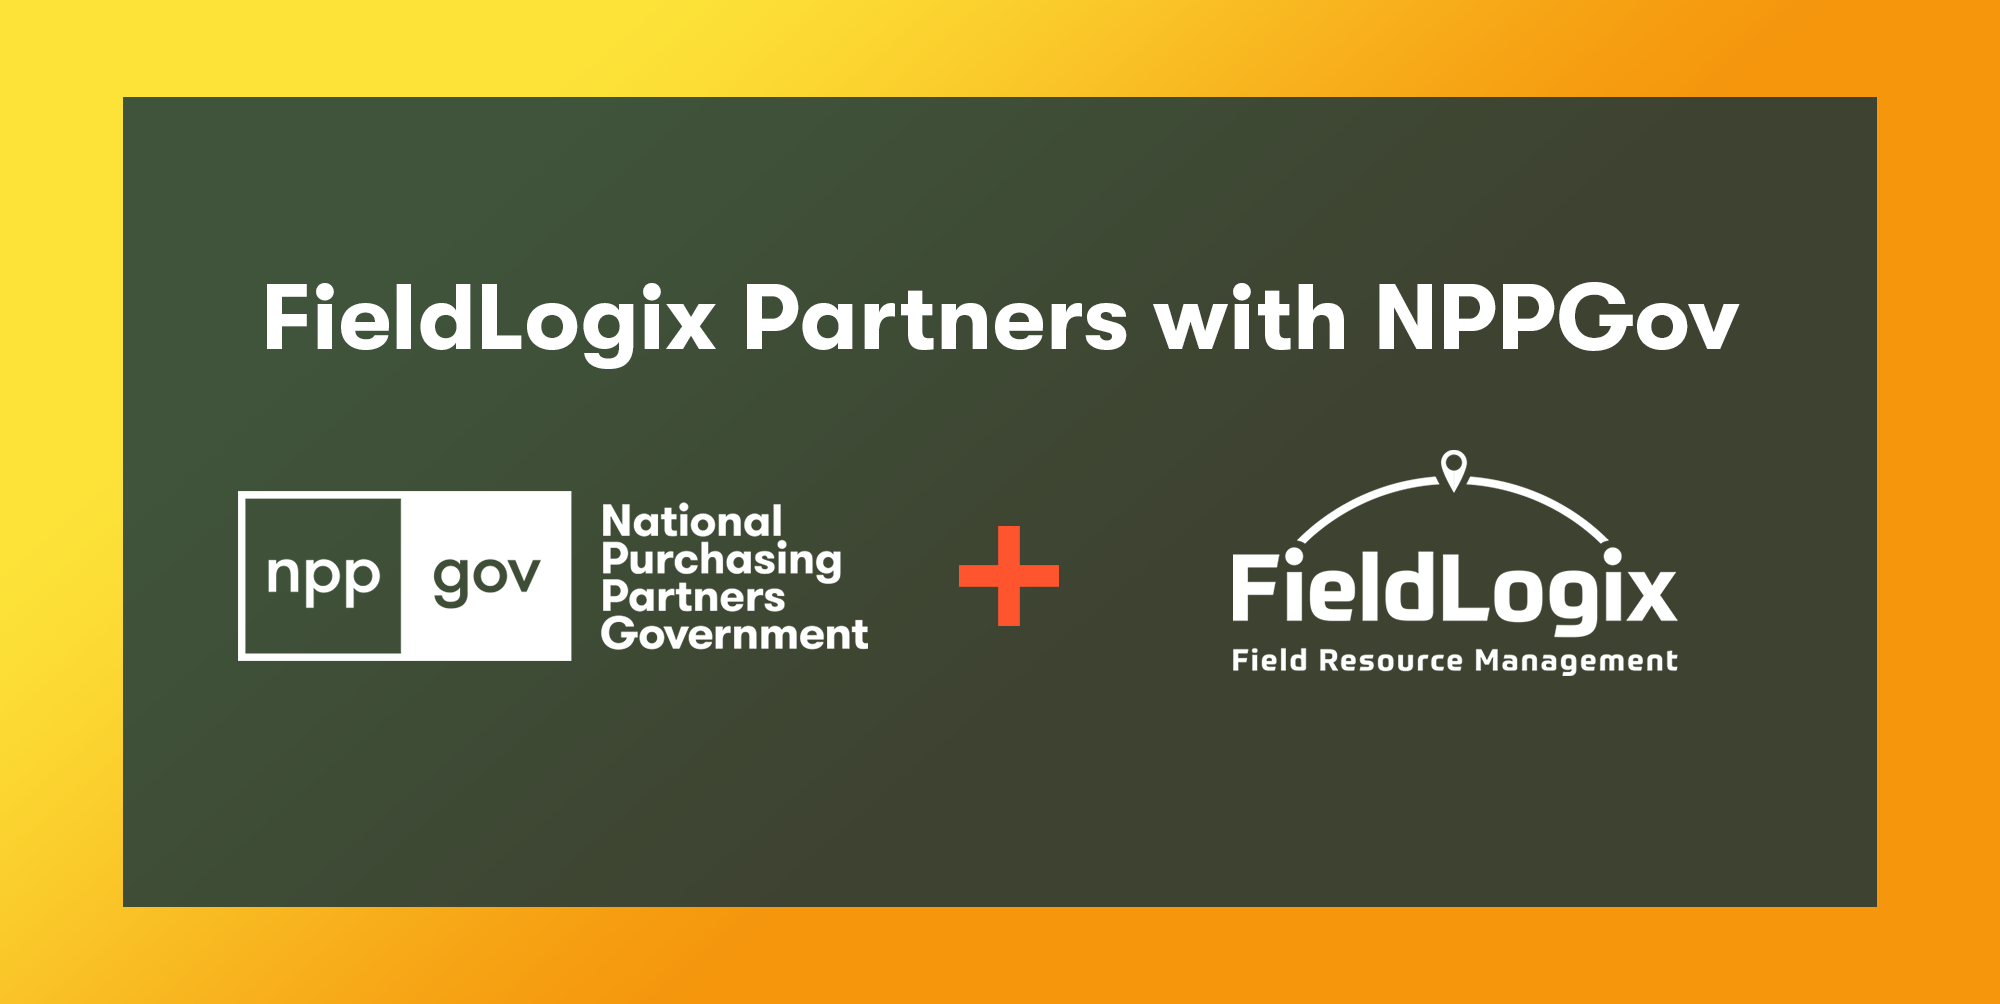 FieldLogix Partners with NPPGov